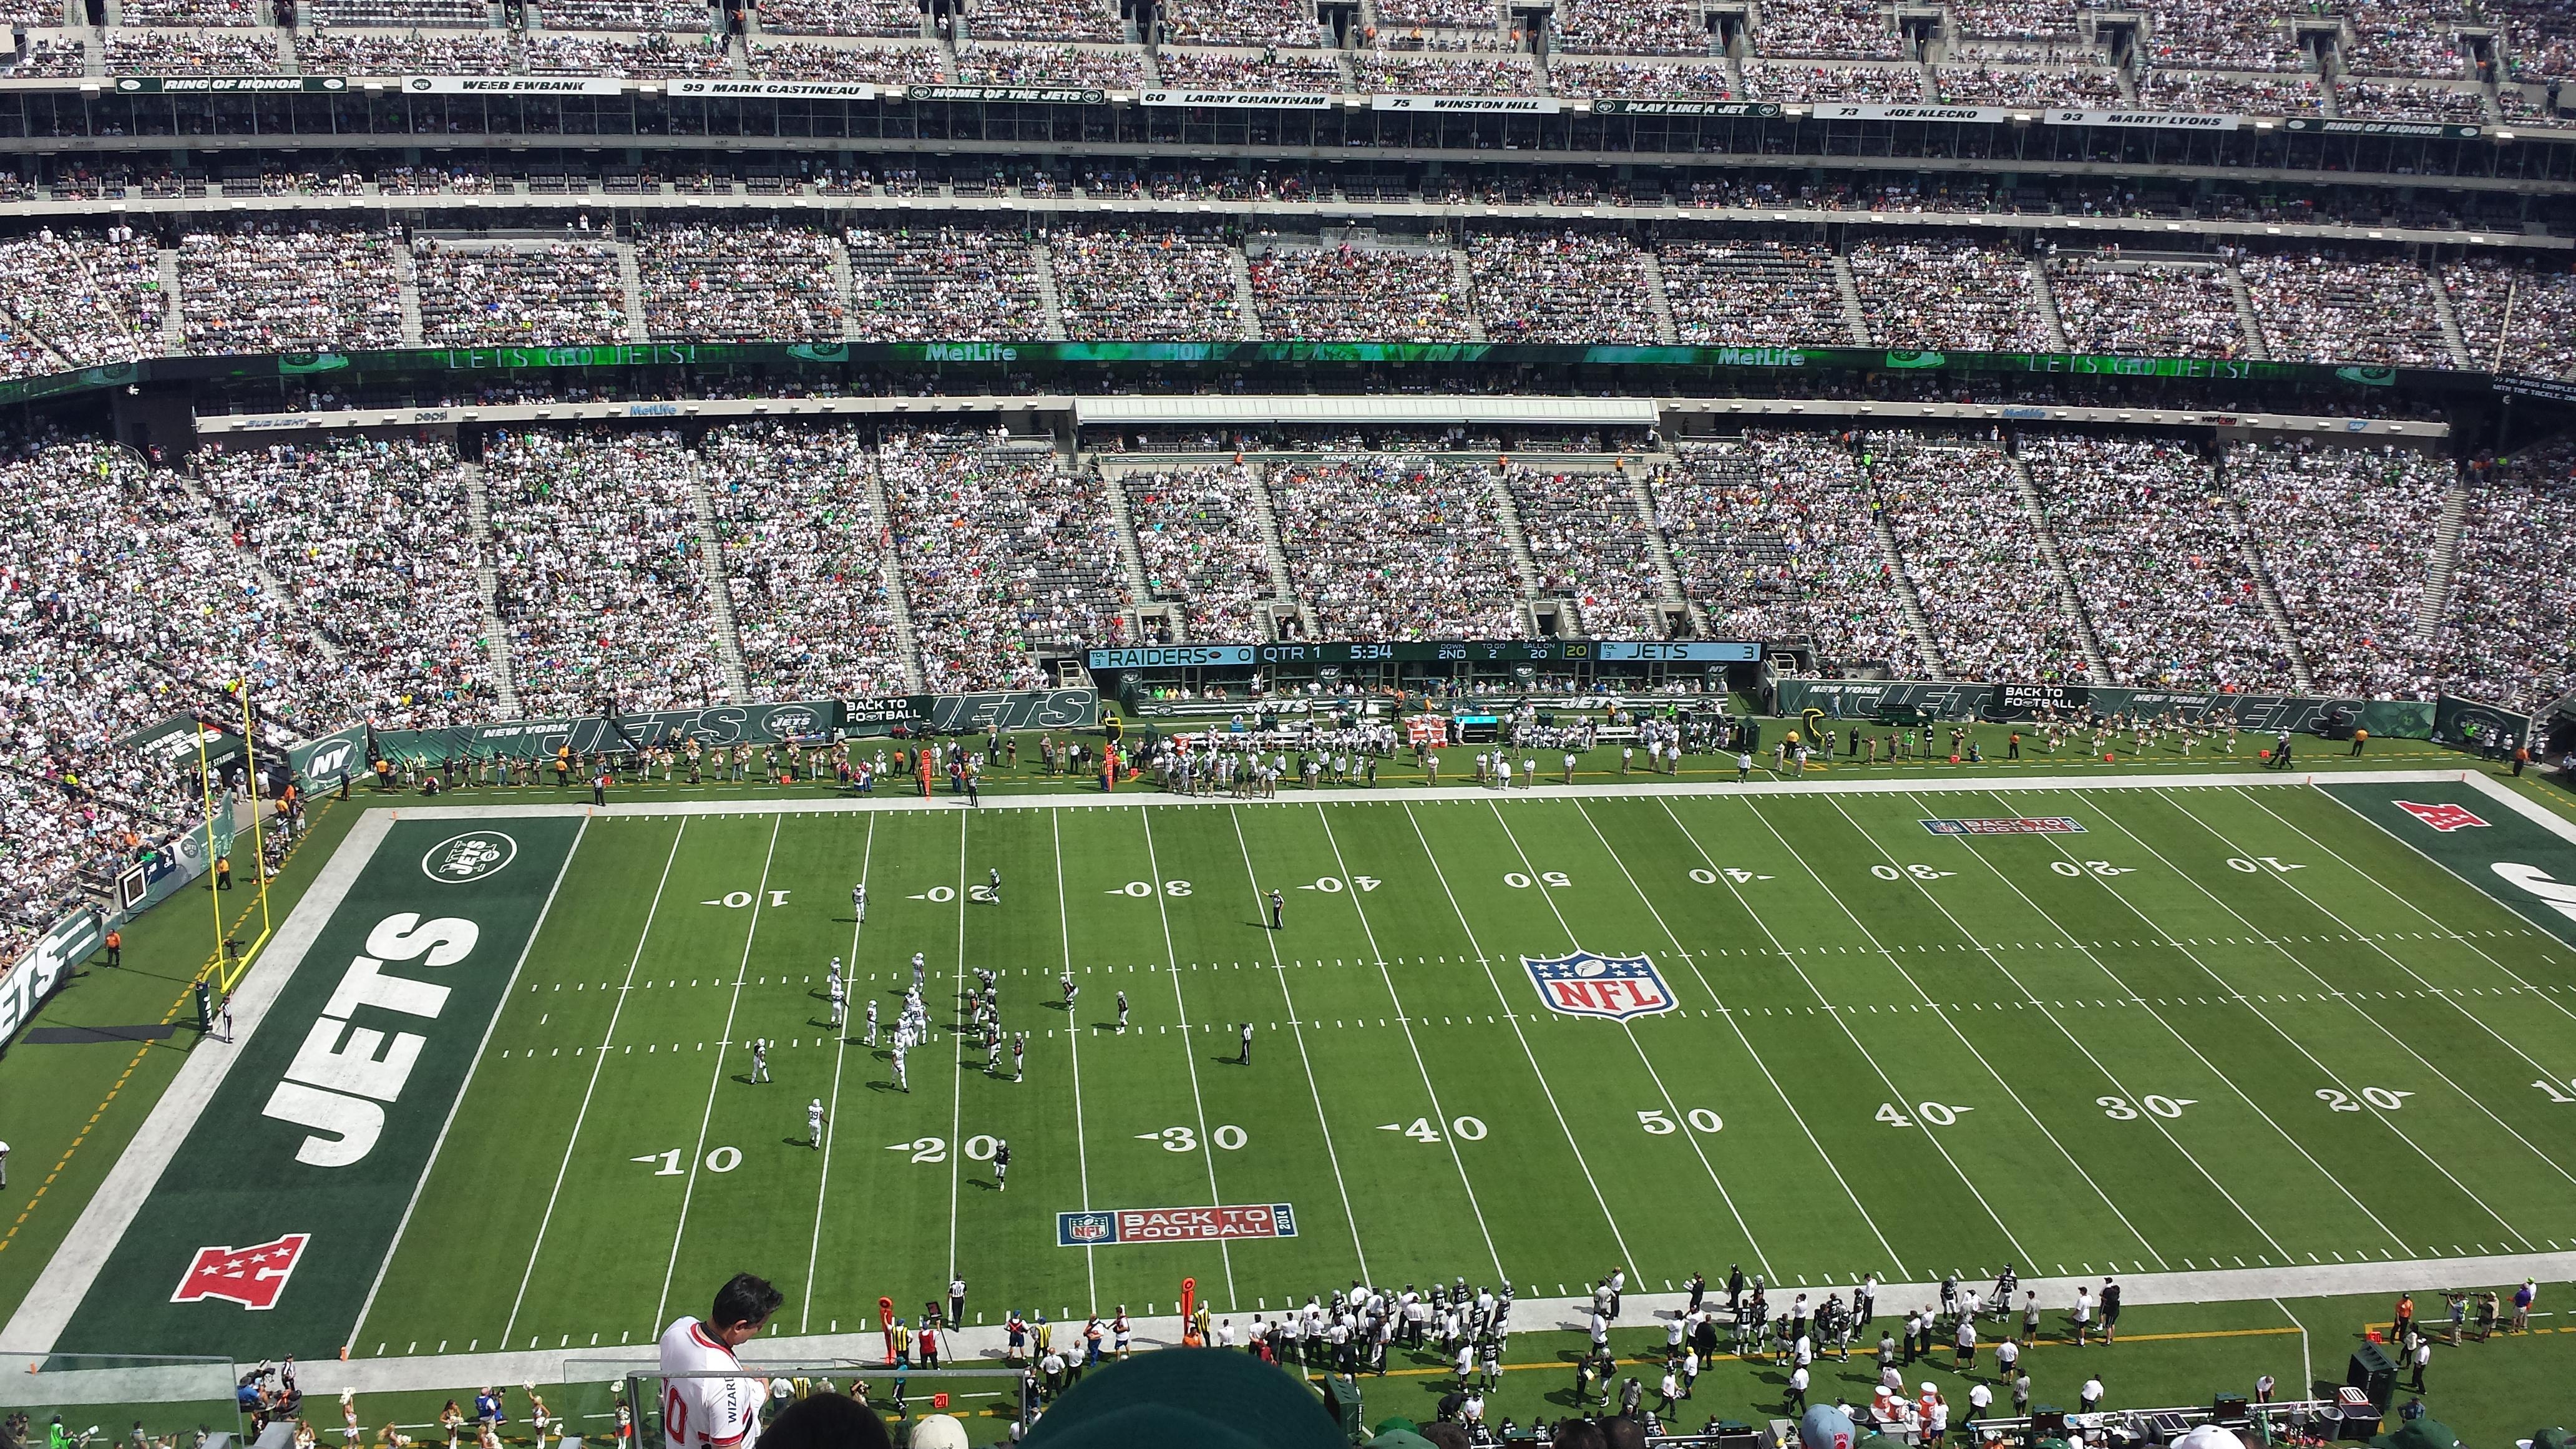 MetLife Stadium Section 340 Row 15 Seat 22